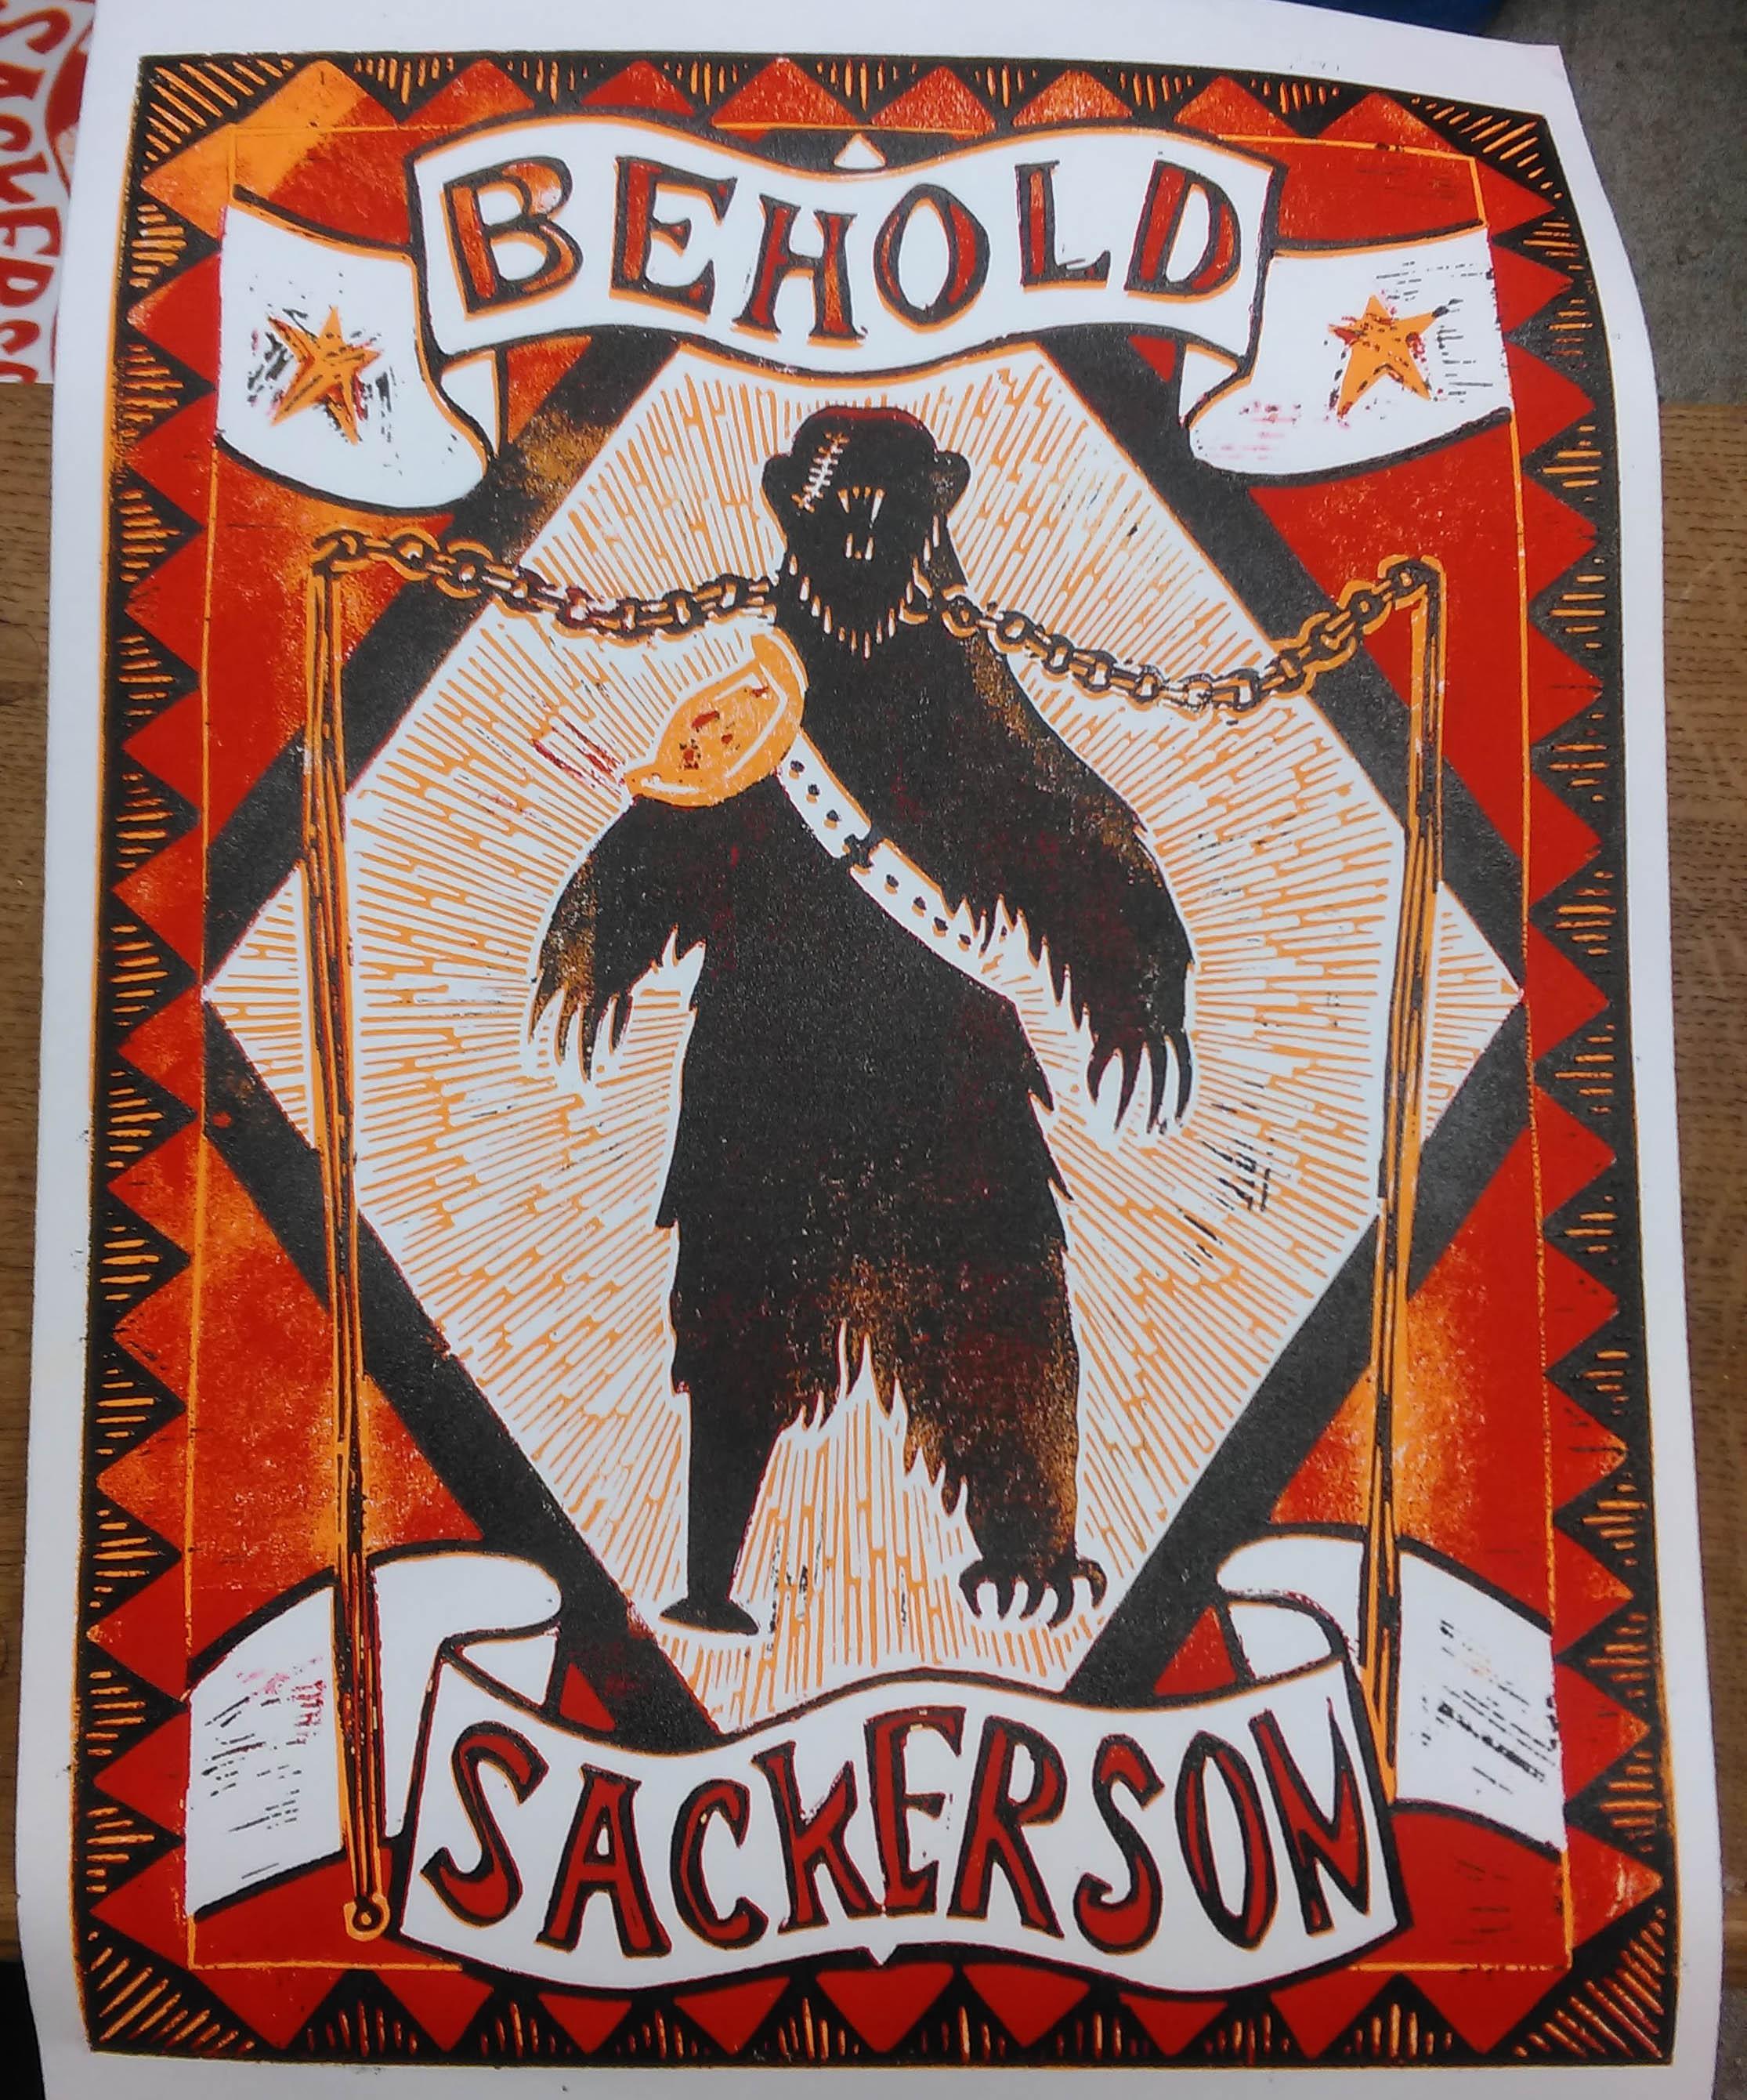 sackerson poster.jpg